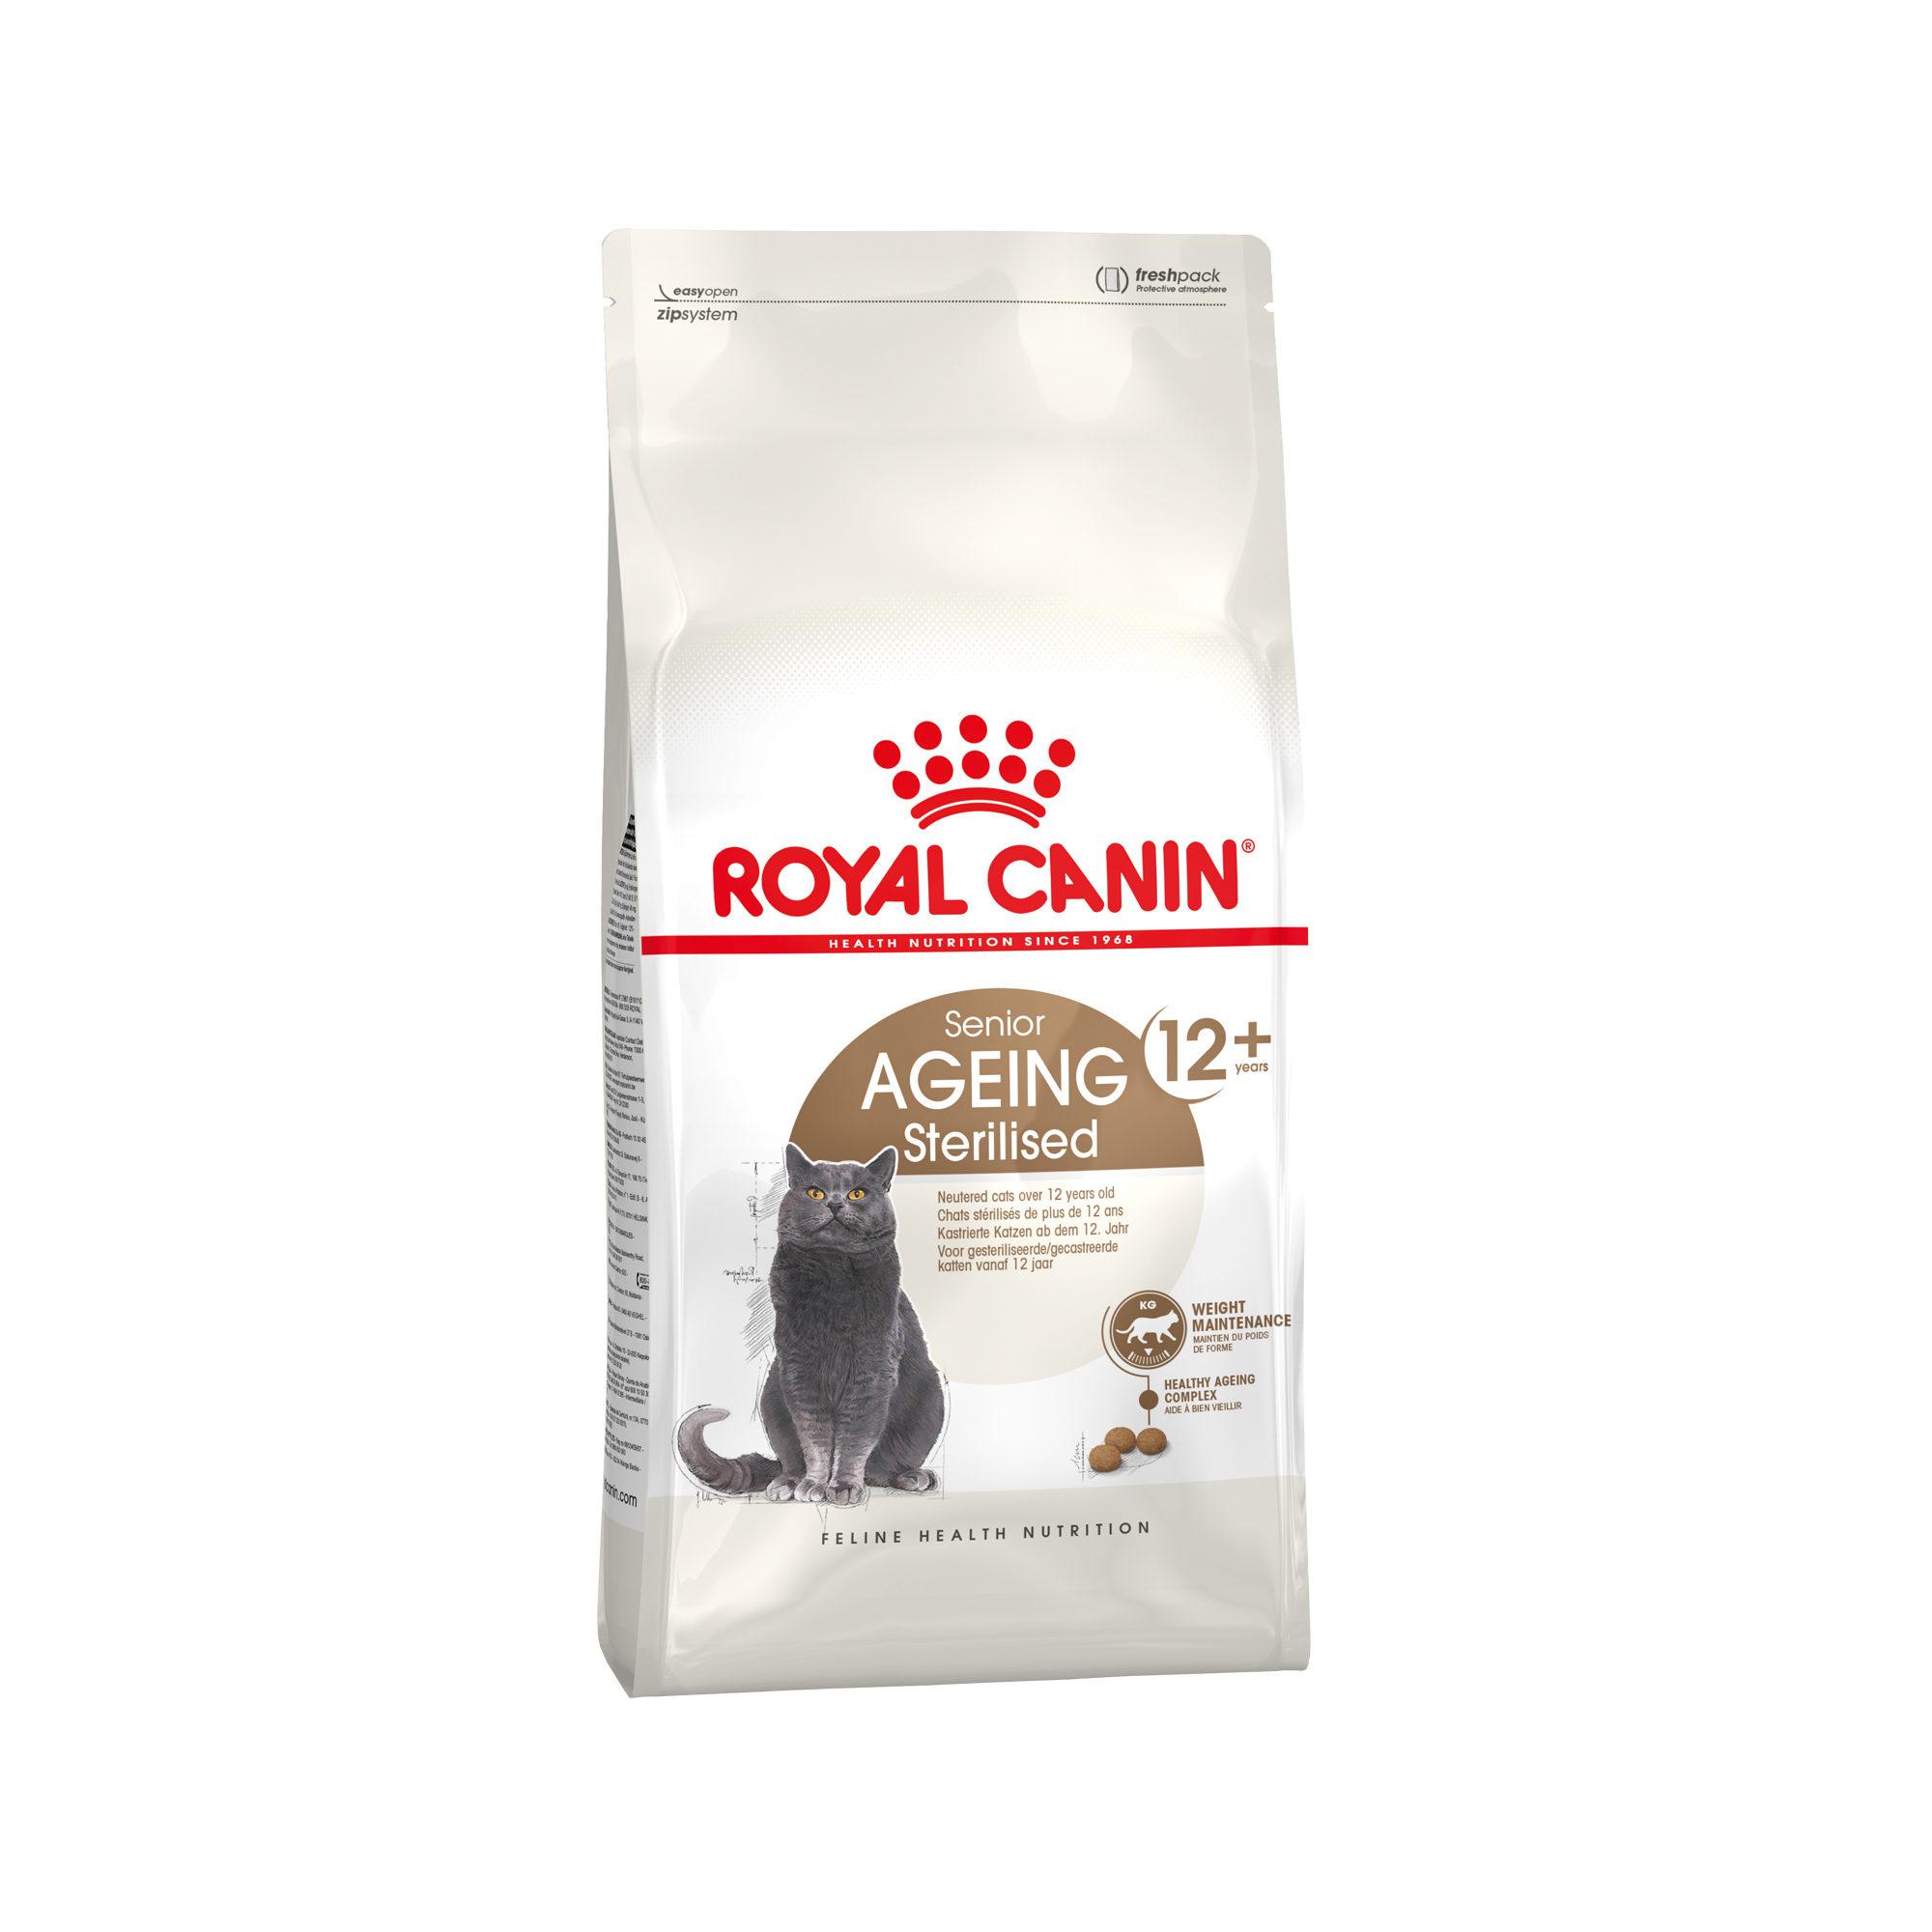 Royal Canin Ageing Sterilised 12+ Katzenfutter